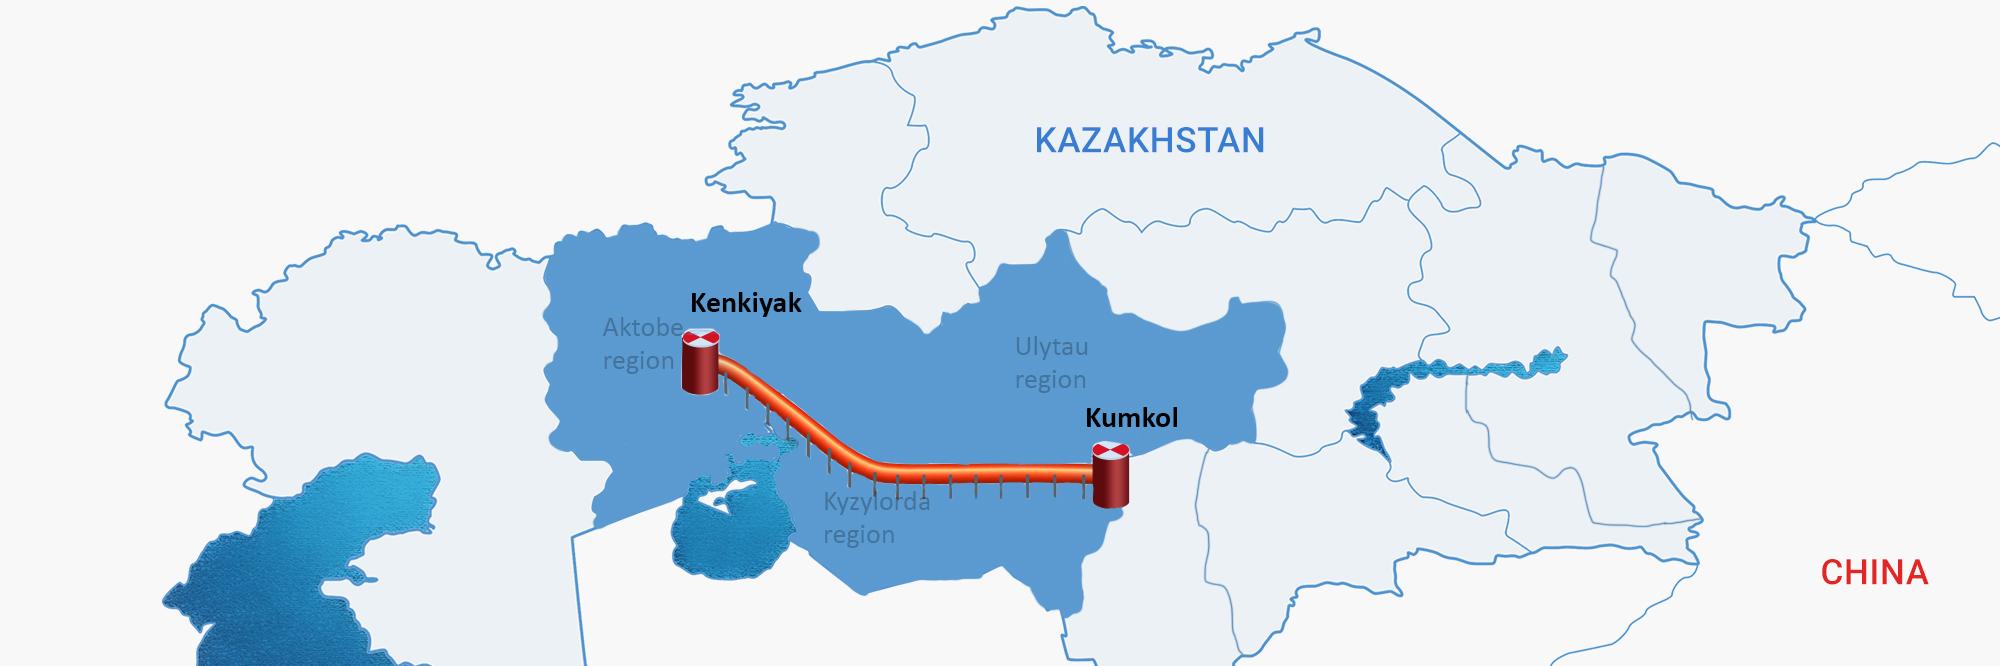 KazakhstanChina Pipeline Kenkiyak Kumkol